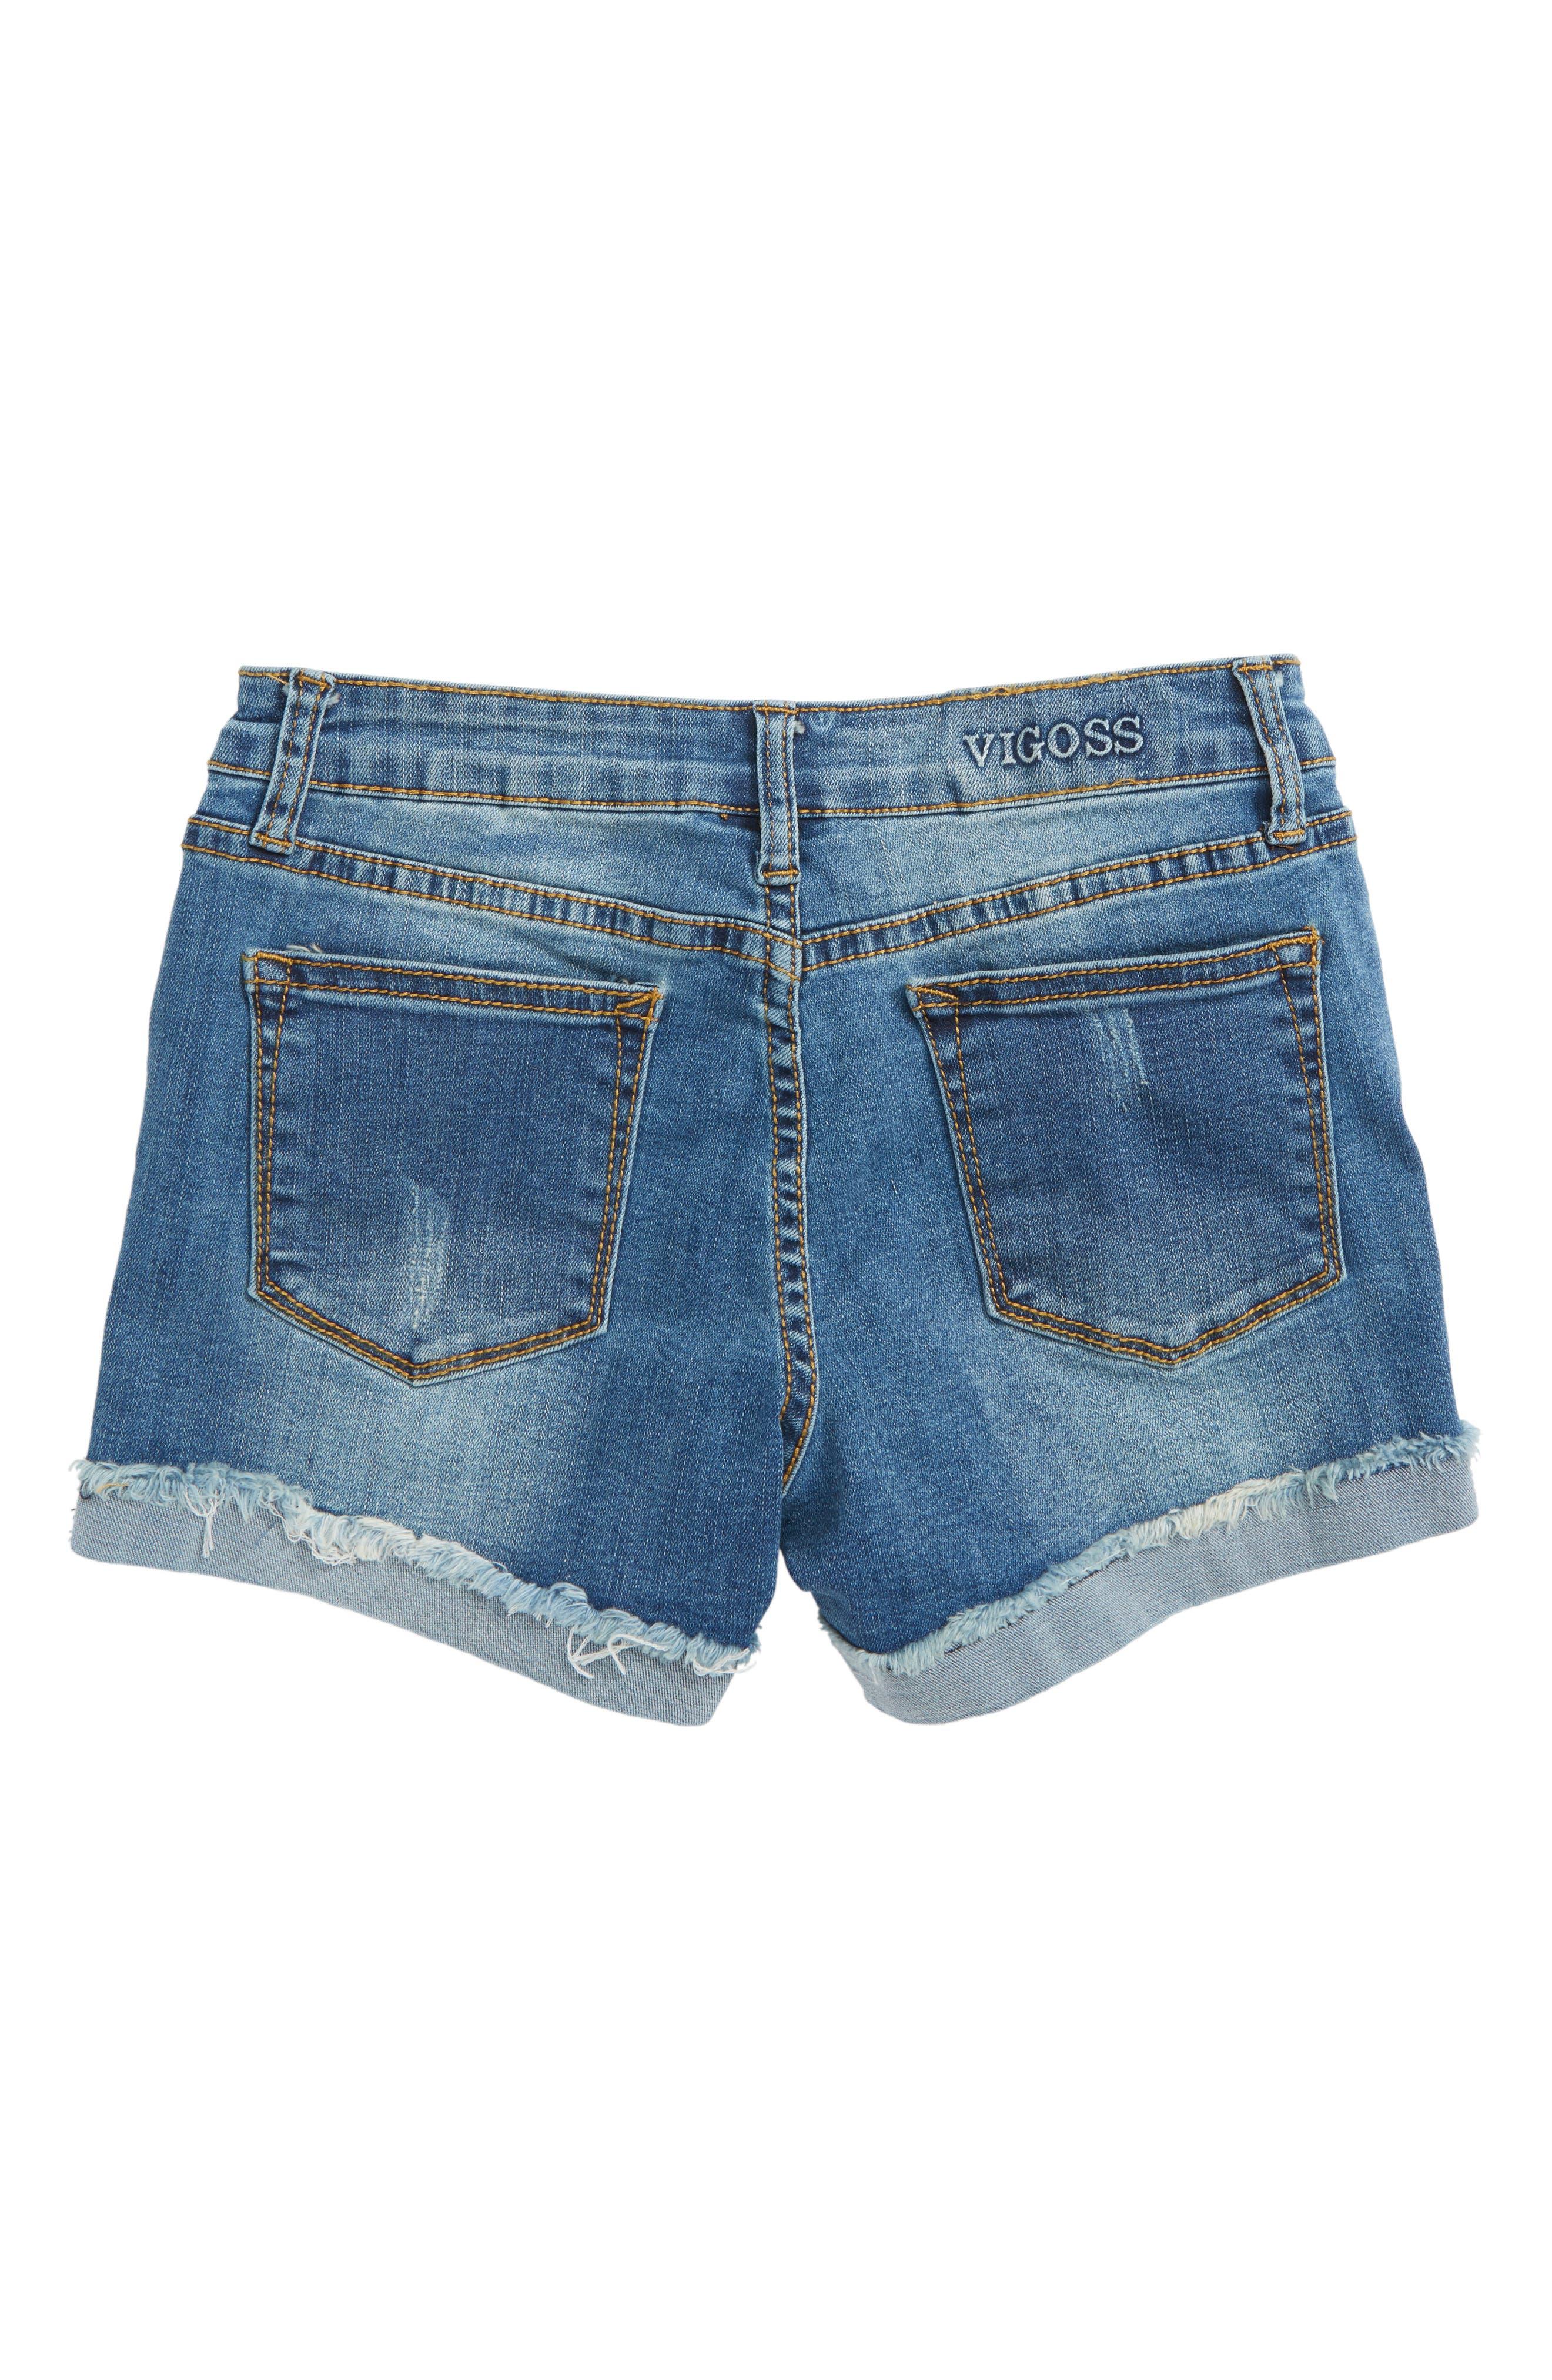 Imitation Pearl Frayed Denim Shorts,                             Alternate thumbnail 2, color,                             487